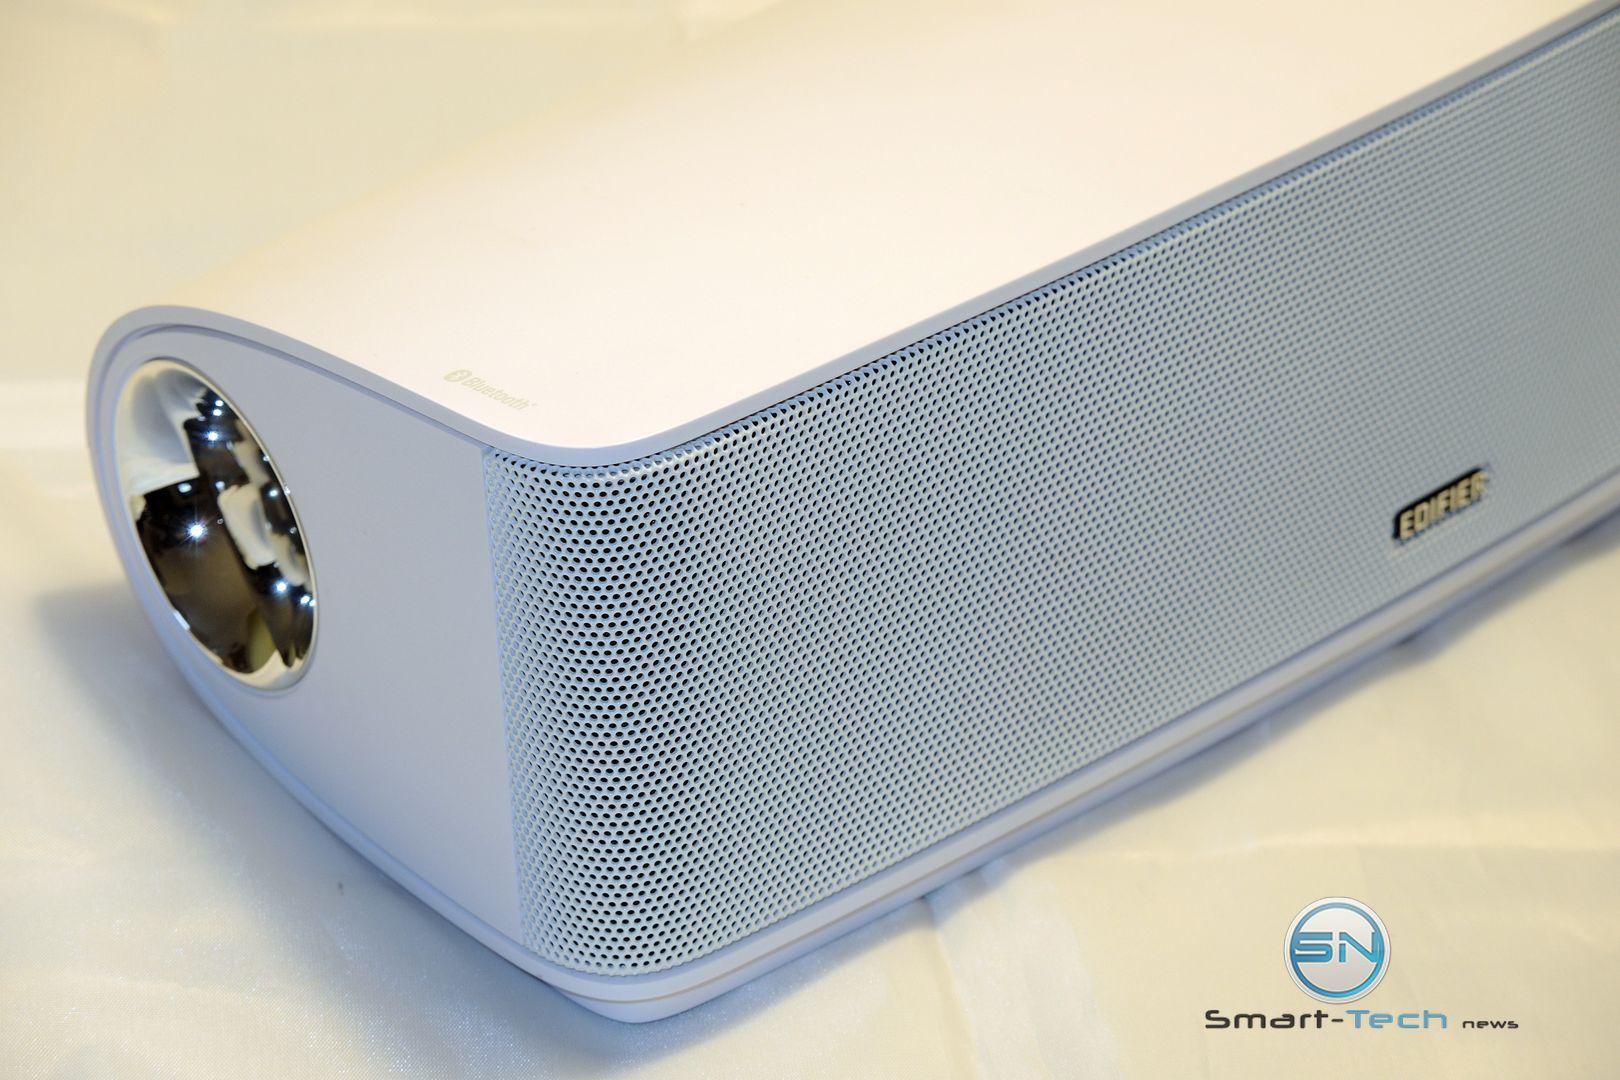 Frontansicht - Edifier IF335BT Bric Connect Bluetooth-Lautsprechersystem mit Infrarot-Fernbedienung AUXIn - SmartTechNews